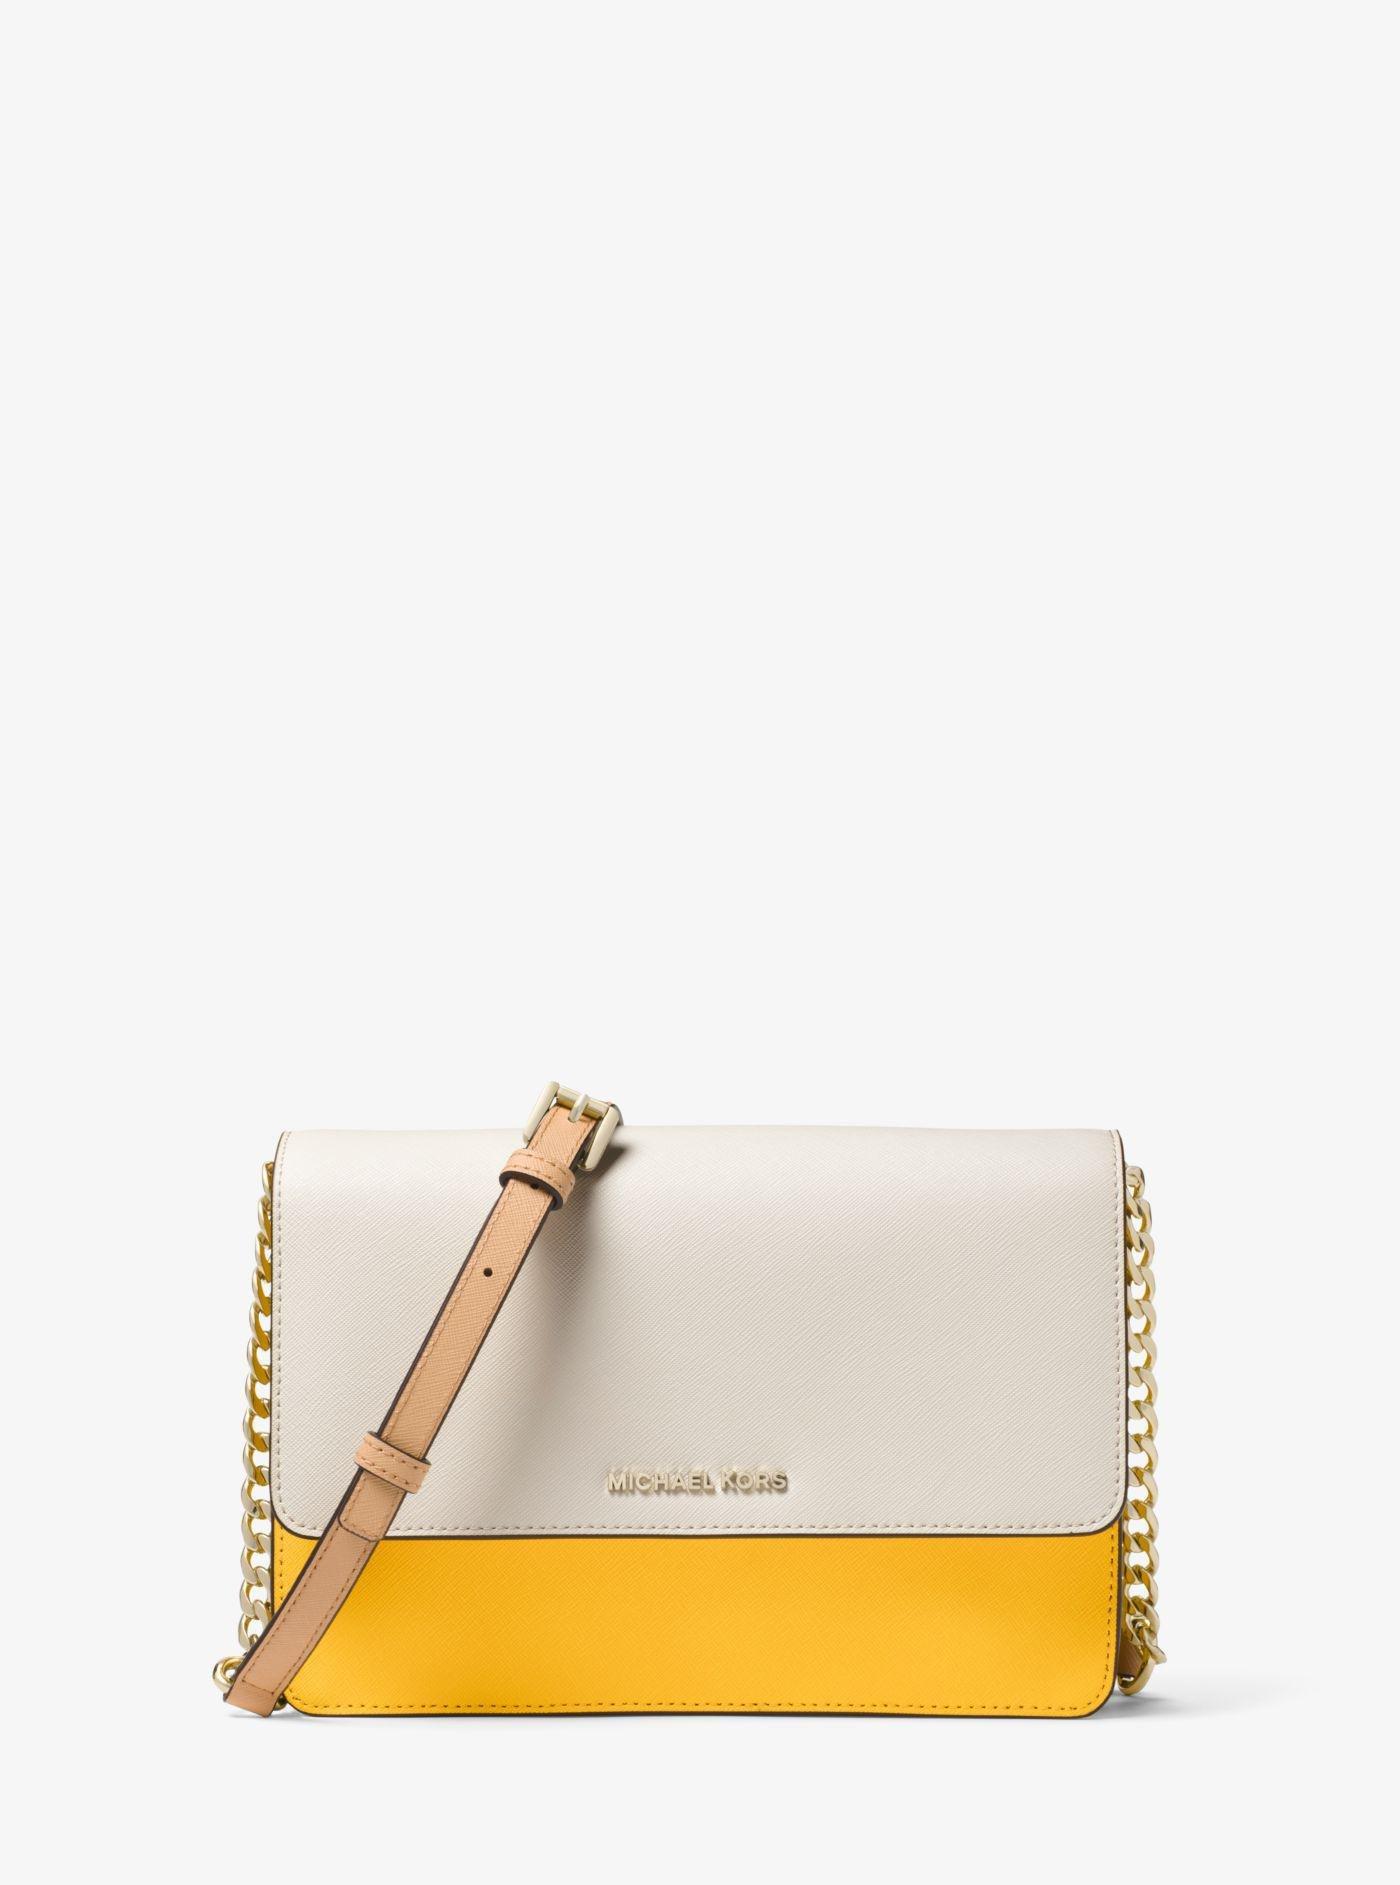 276ed1b9a1ab Michael Kors Daniela Large Color-block Saffiano Leather Crossbody - Lyst